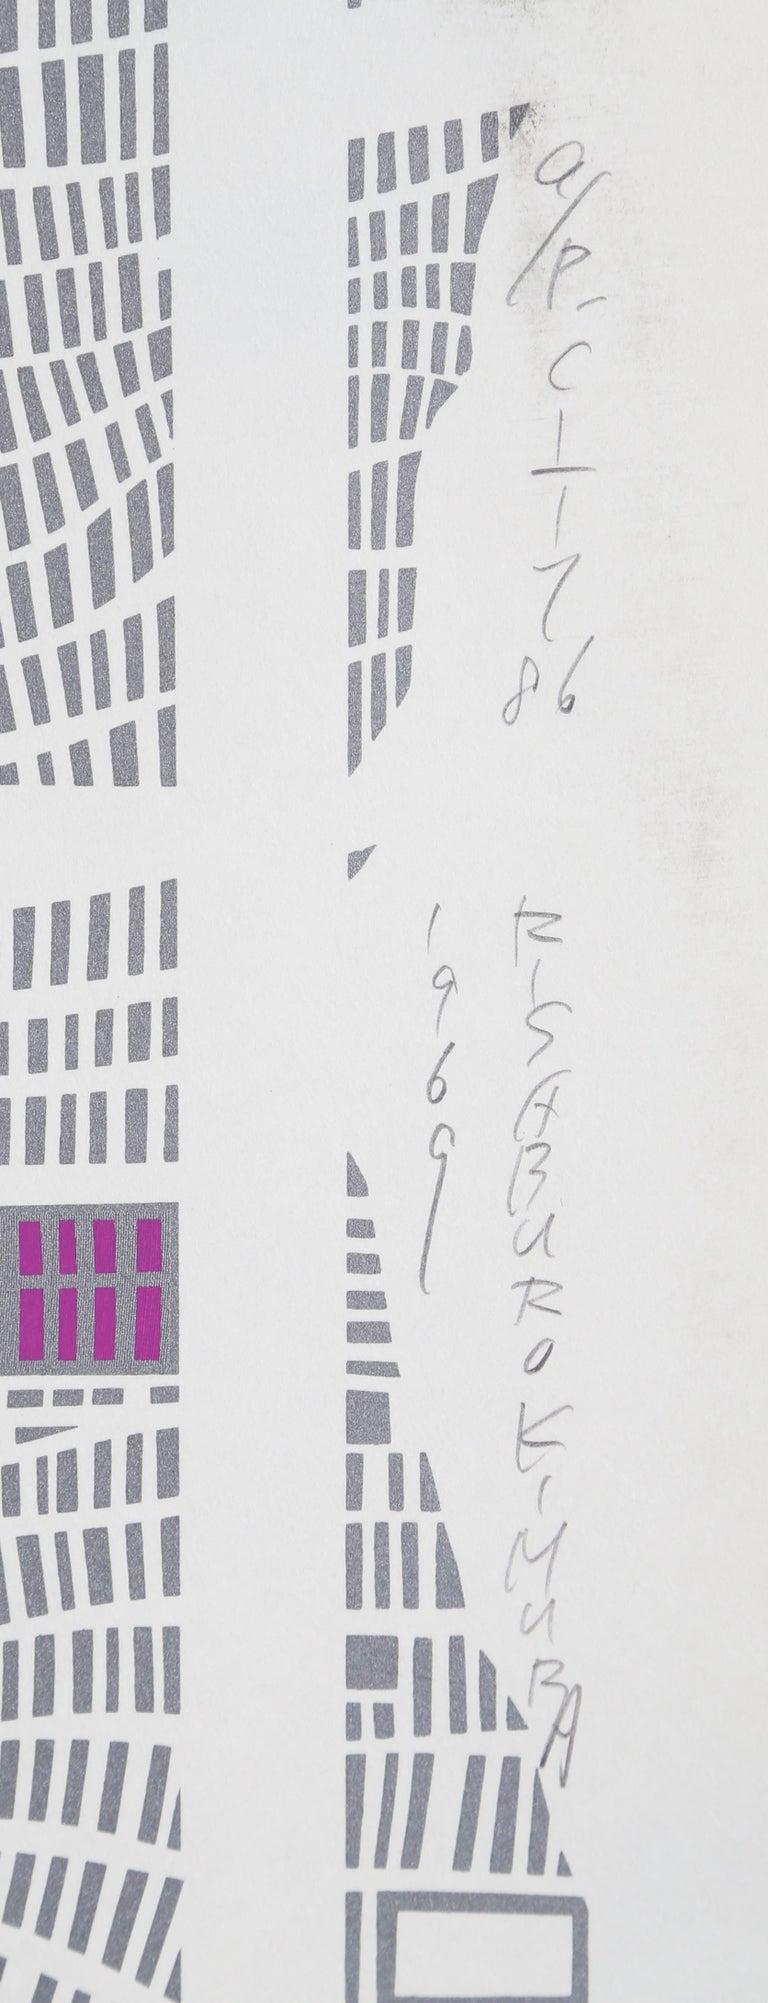 City 86, Abstract Print by Risaburo Kimura  For Sale 1